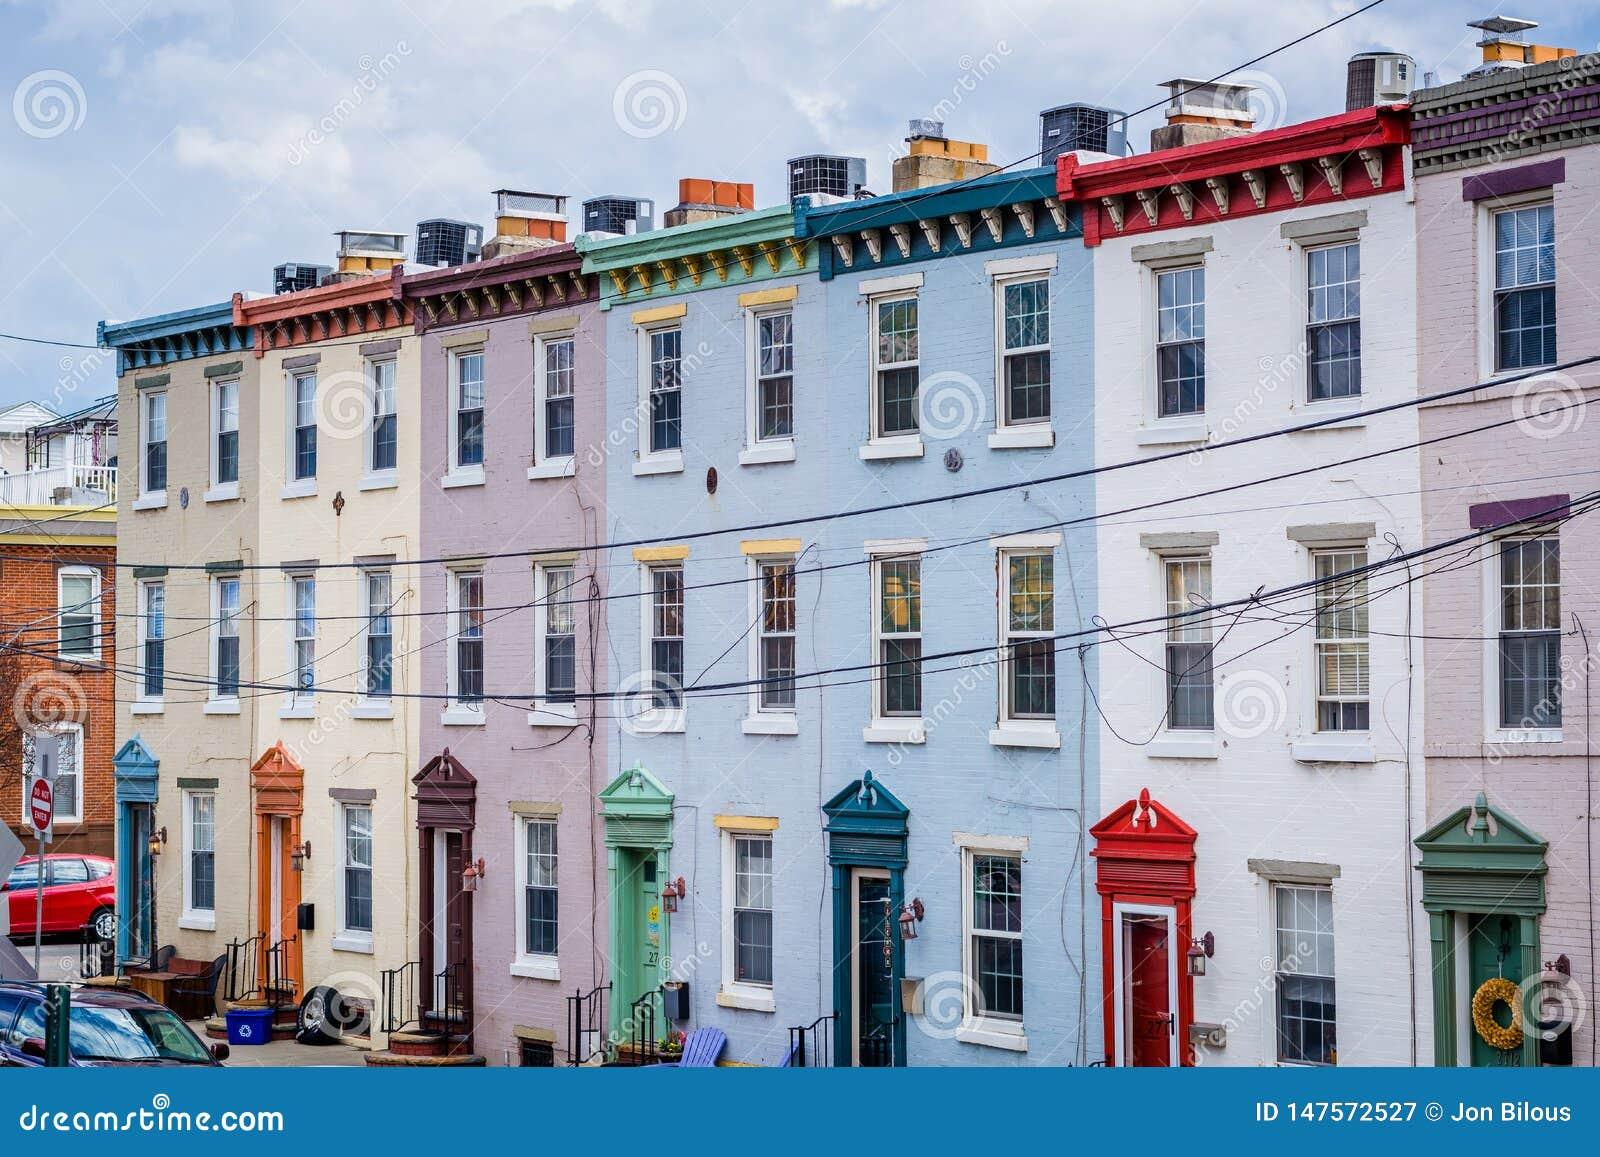 Row houses along Schuylkill Avenue in Philadelphia, Pennsylvania